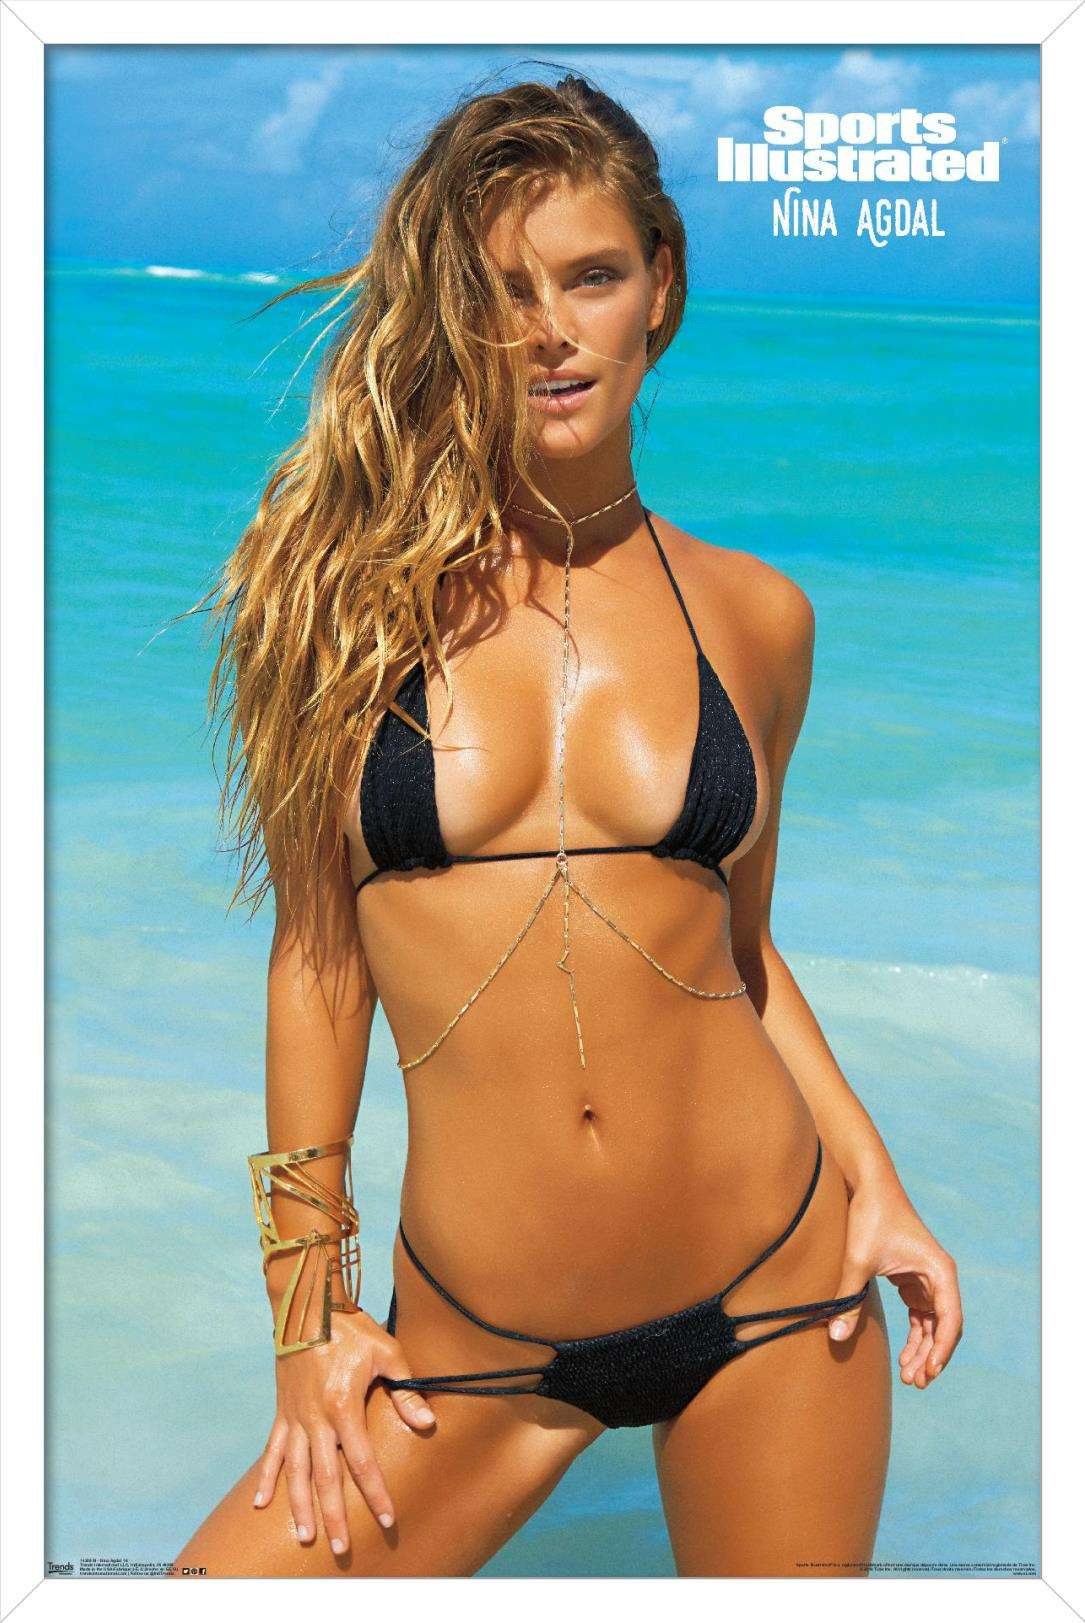 Nina Agdal - Sports Illustrated Swimsuit Calendar 2016